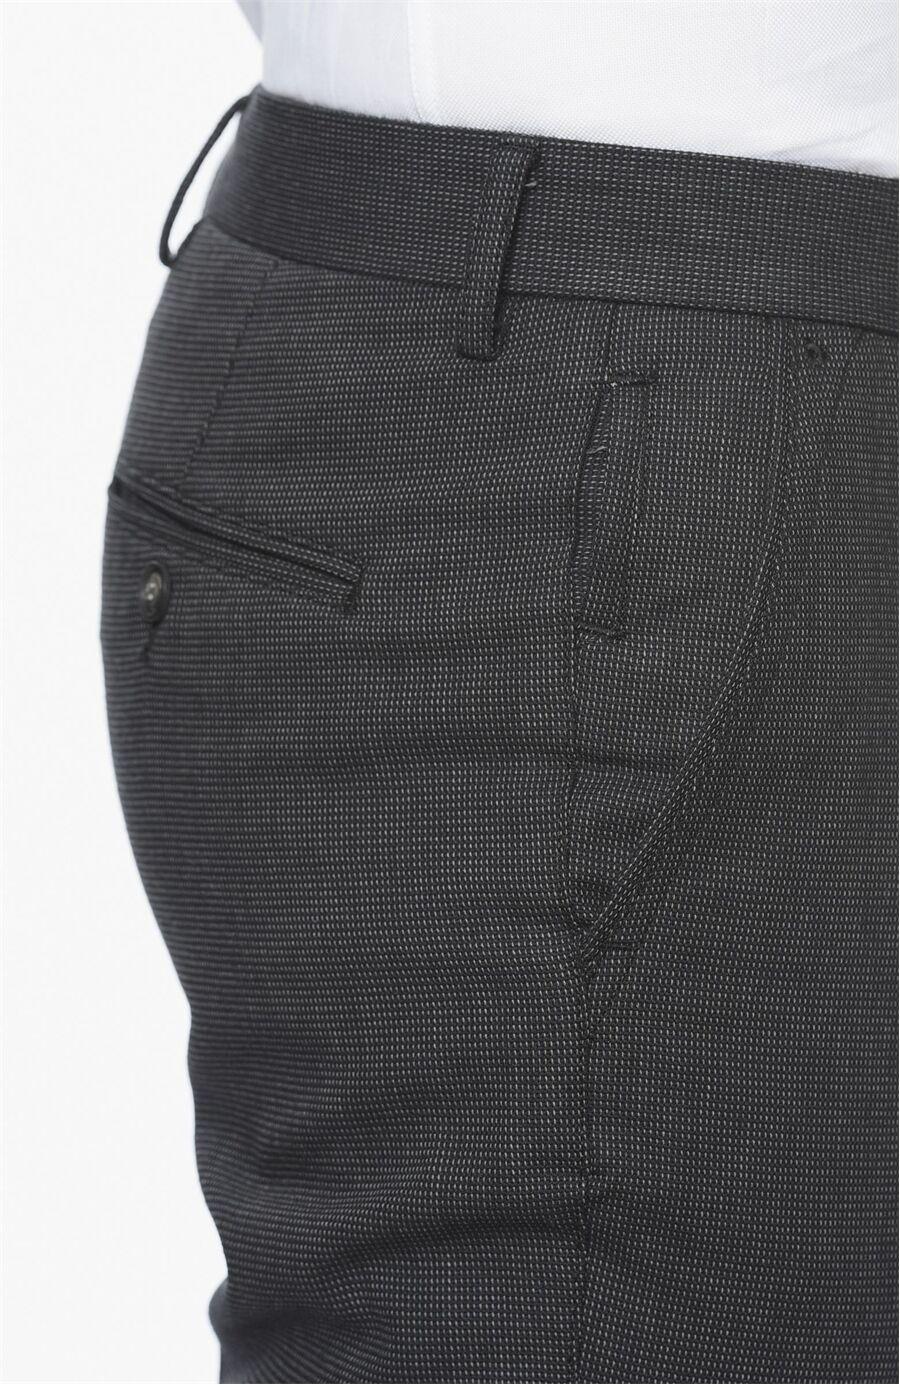 Mikro Desenli Slım Fit Erkek Pantolon